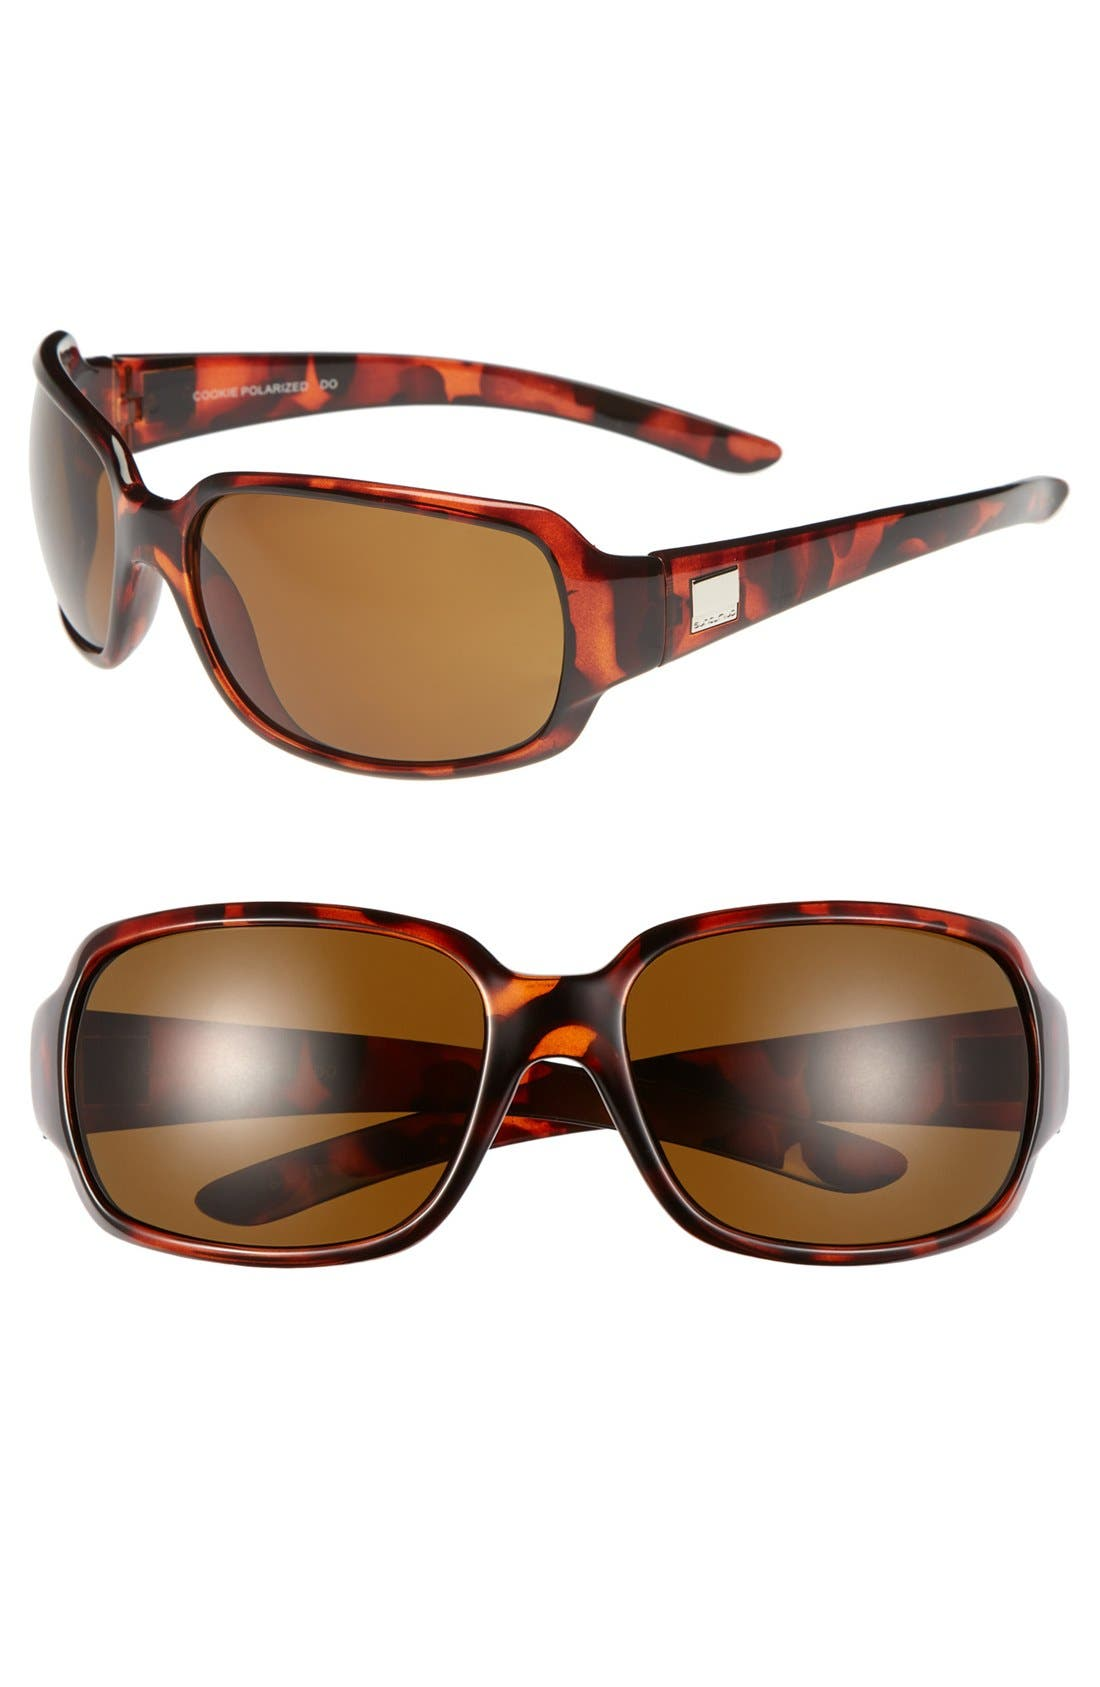 73e715e027 Suncloud sunglasses for women nordstrom jpg 480x730 Suncloud cookie